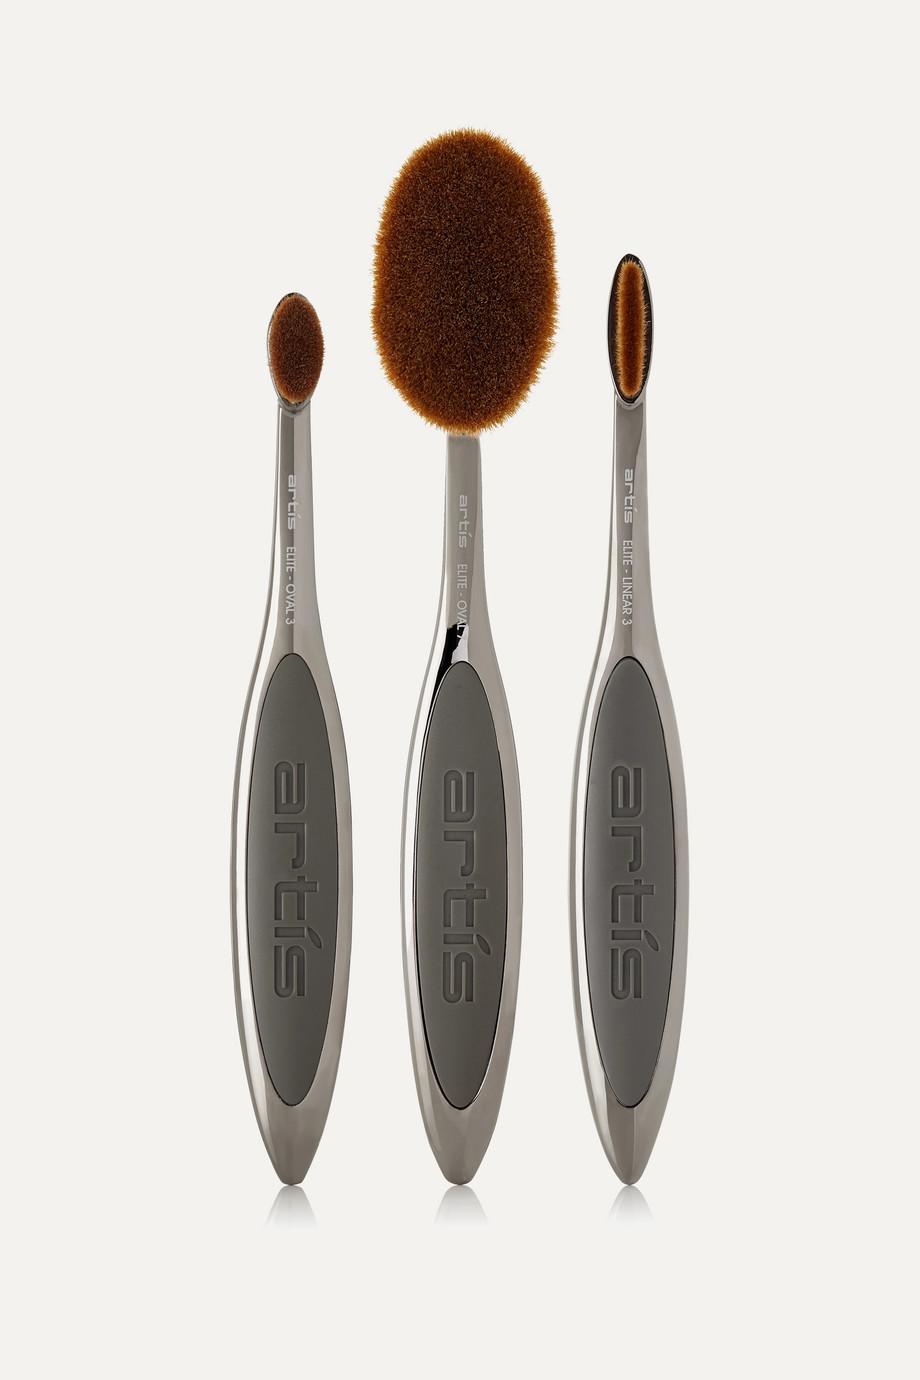 Artis Brush Elite Smoke Three Brush Set